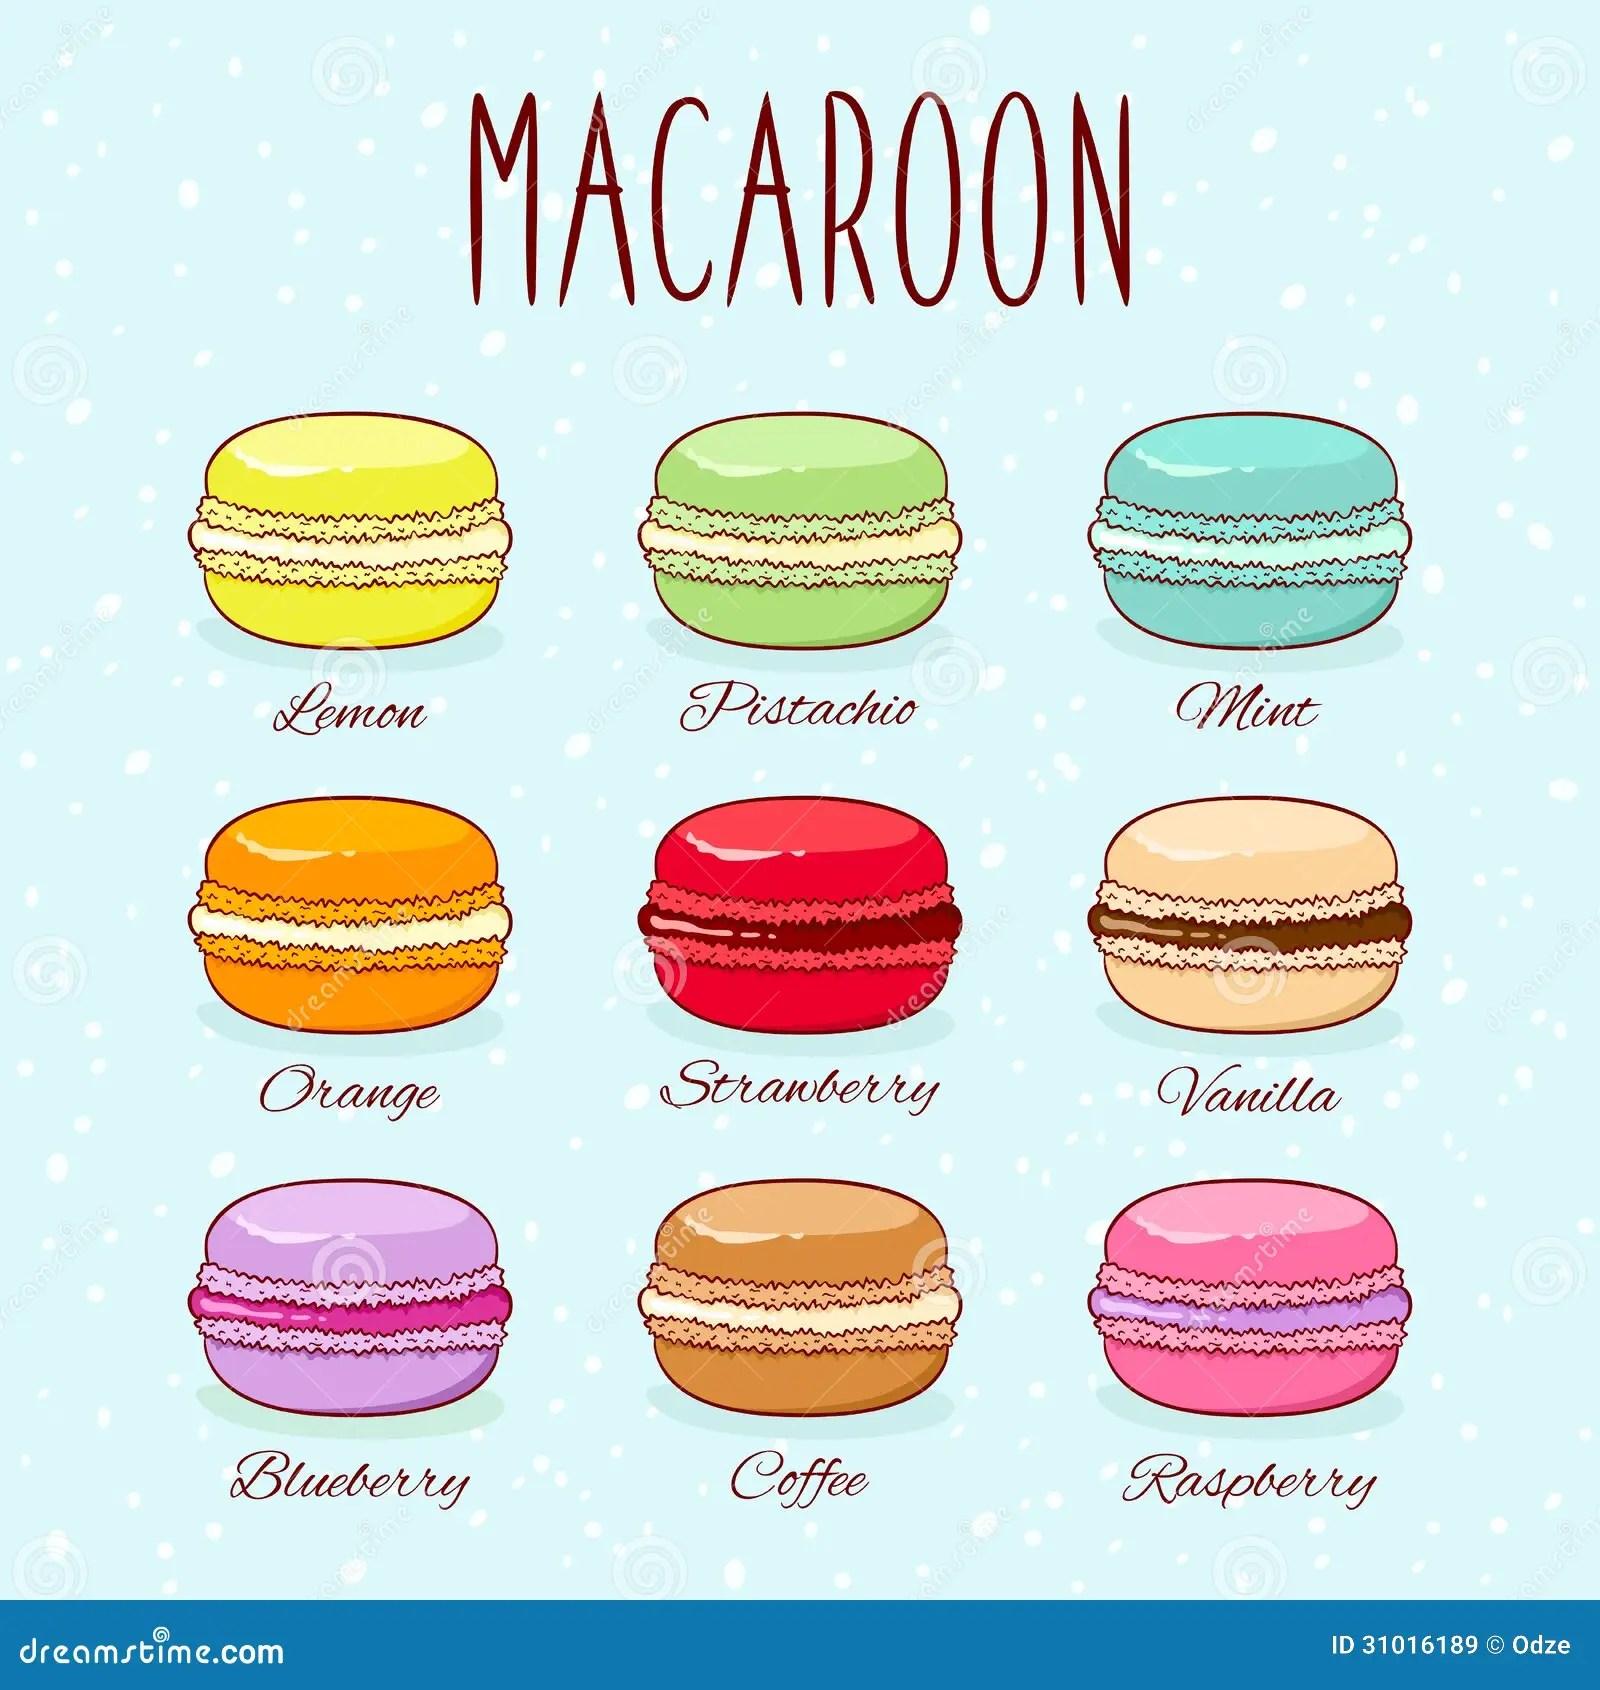 Cute Macaroons Wallpaper Macaroons Stock Vector Illustration Of Orange Cookies